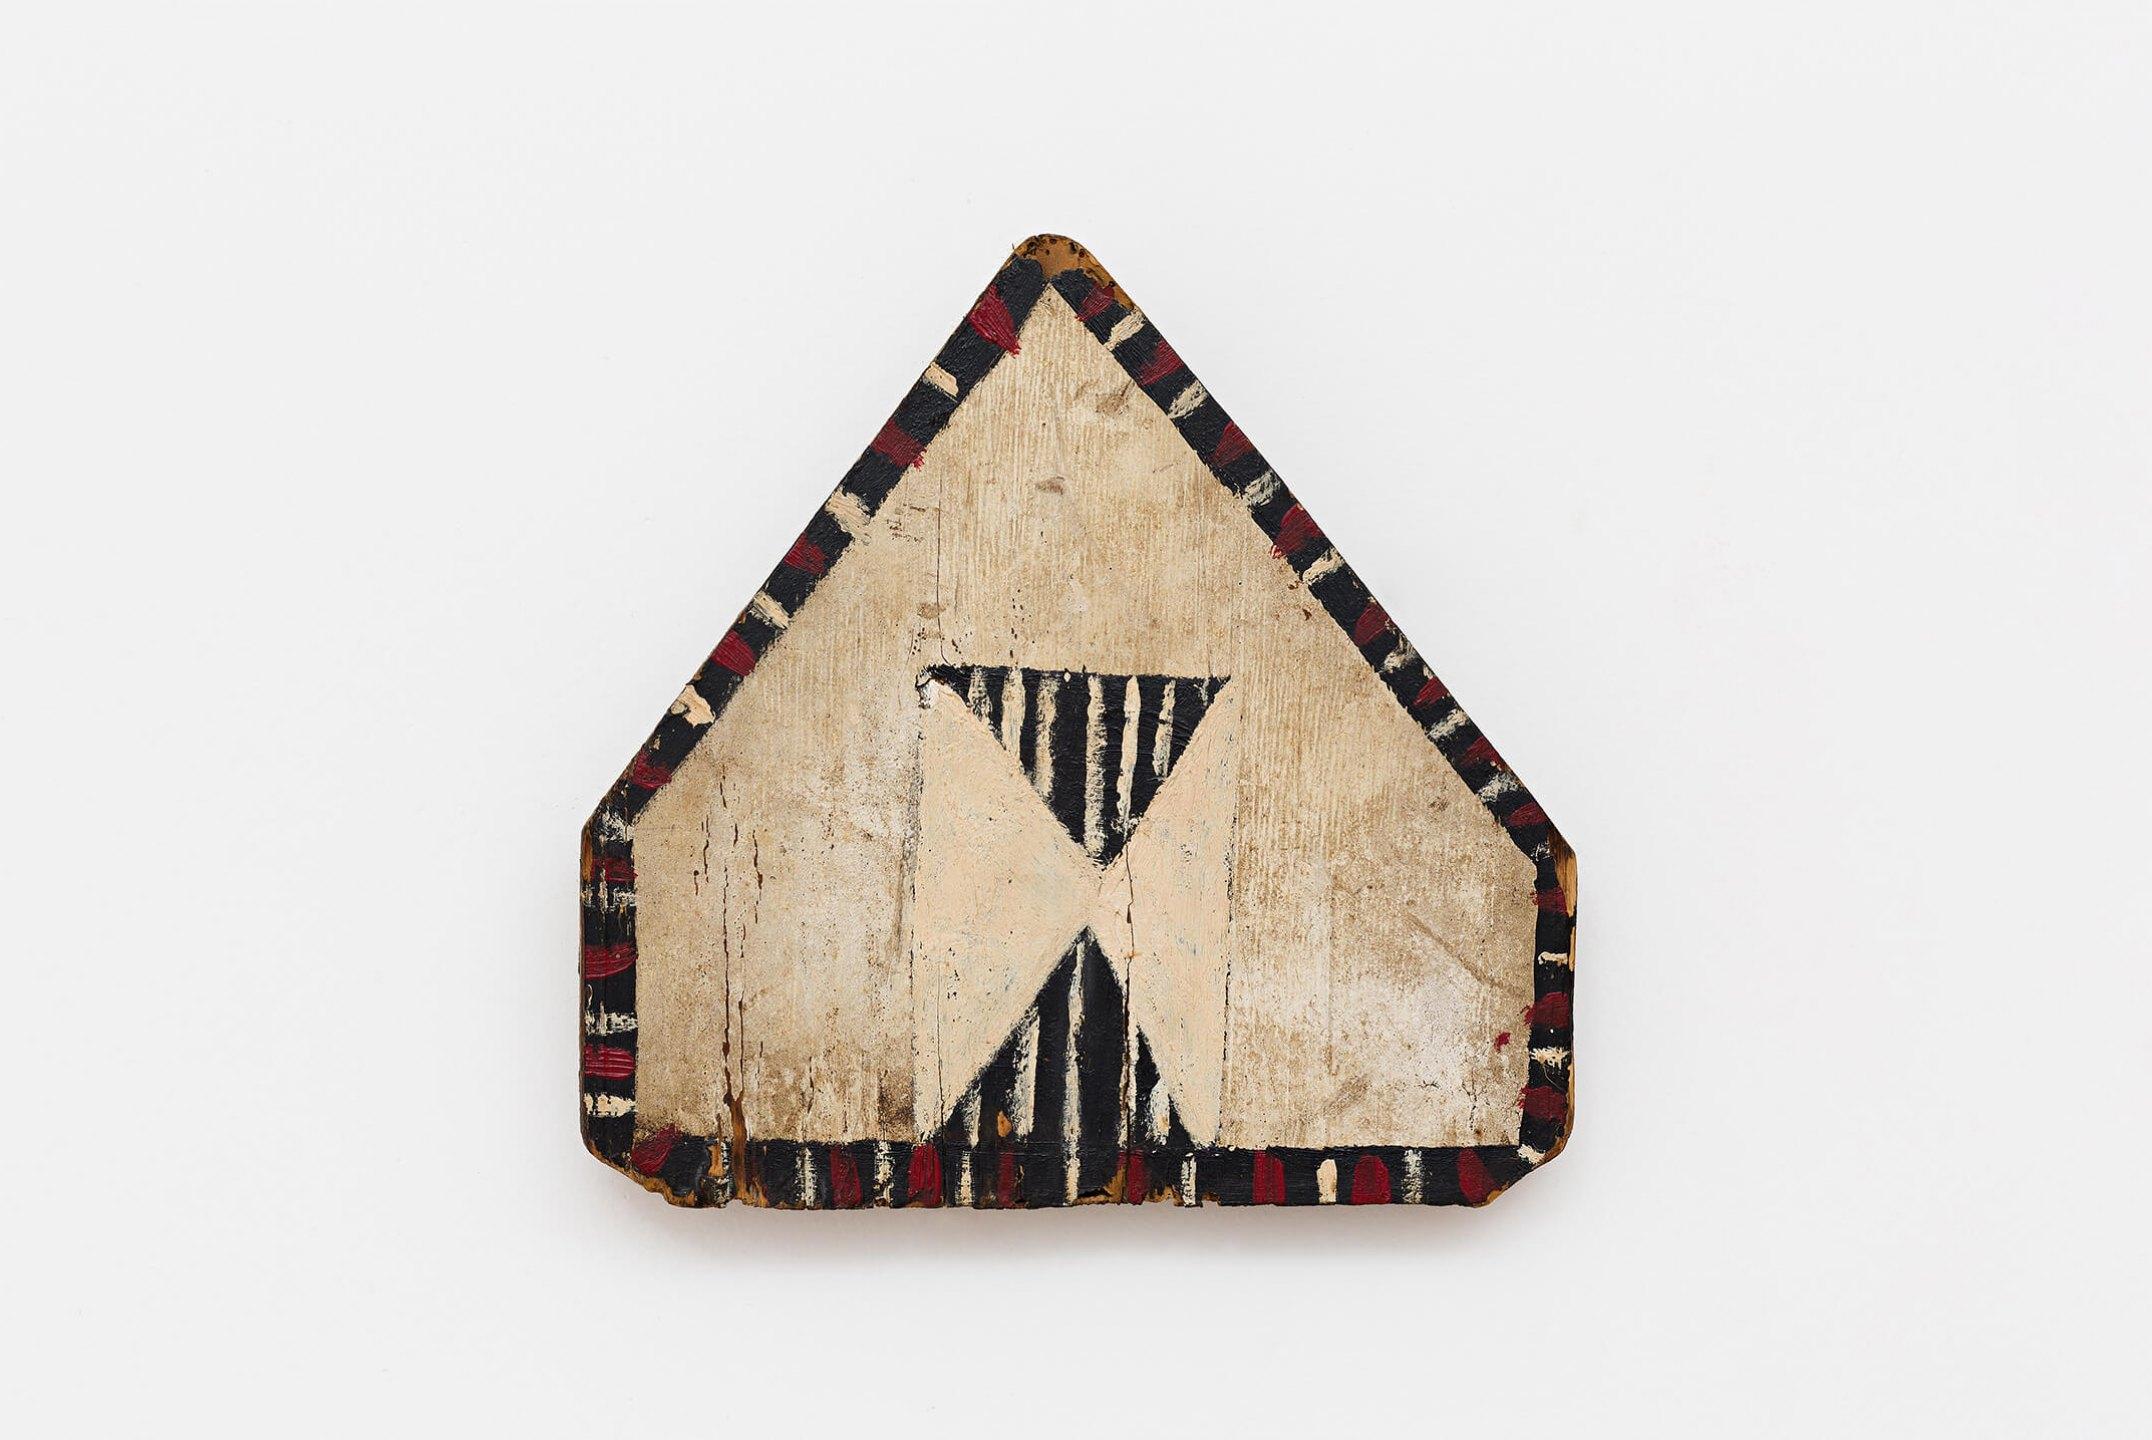 Celso Renato, <em>untitled</em>, circa 1975, acrylic on wood, 21 × 21 × 2 cm - Mendes Wood DM